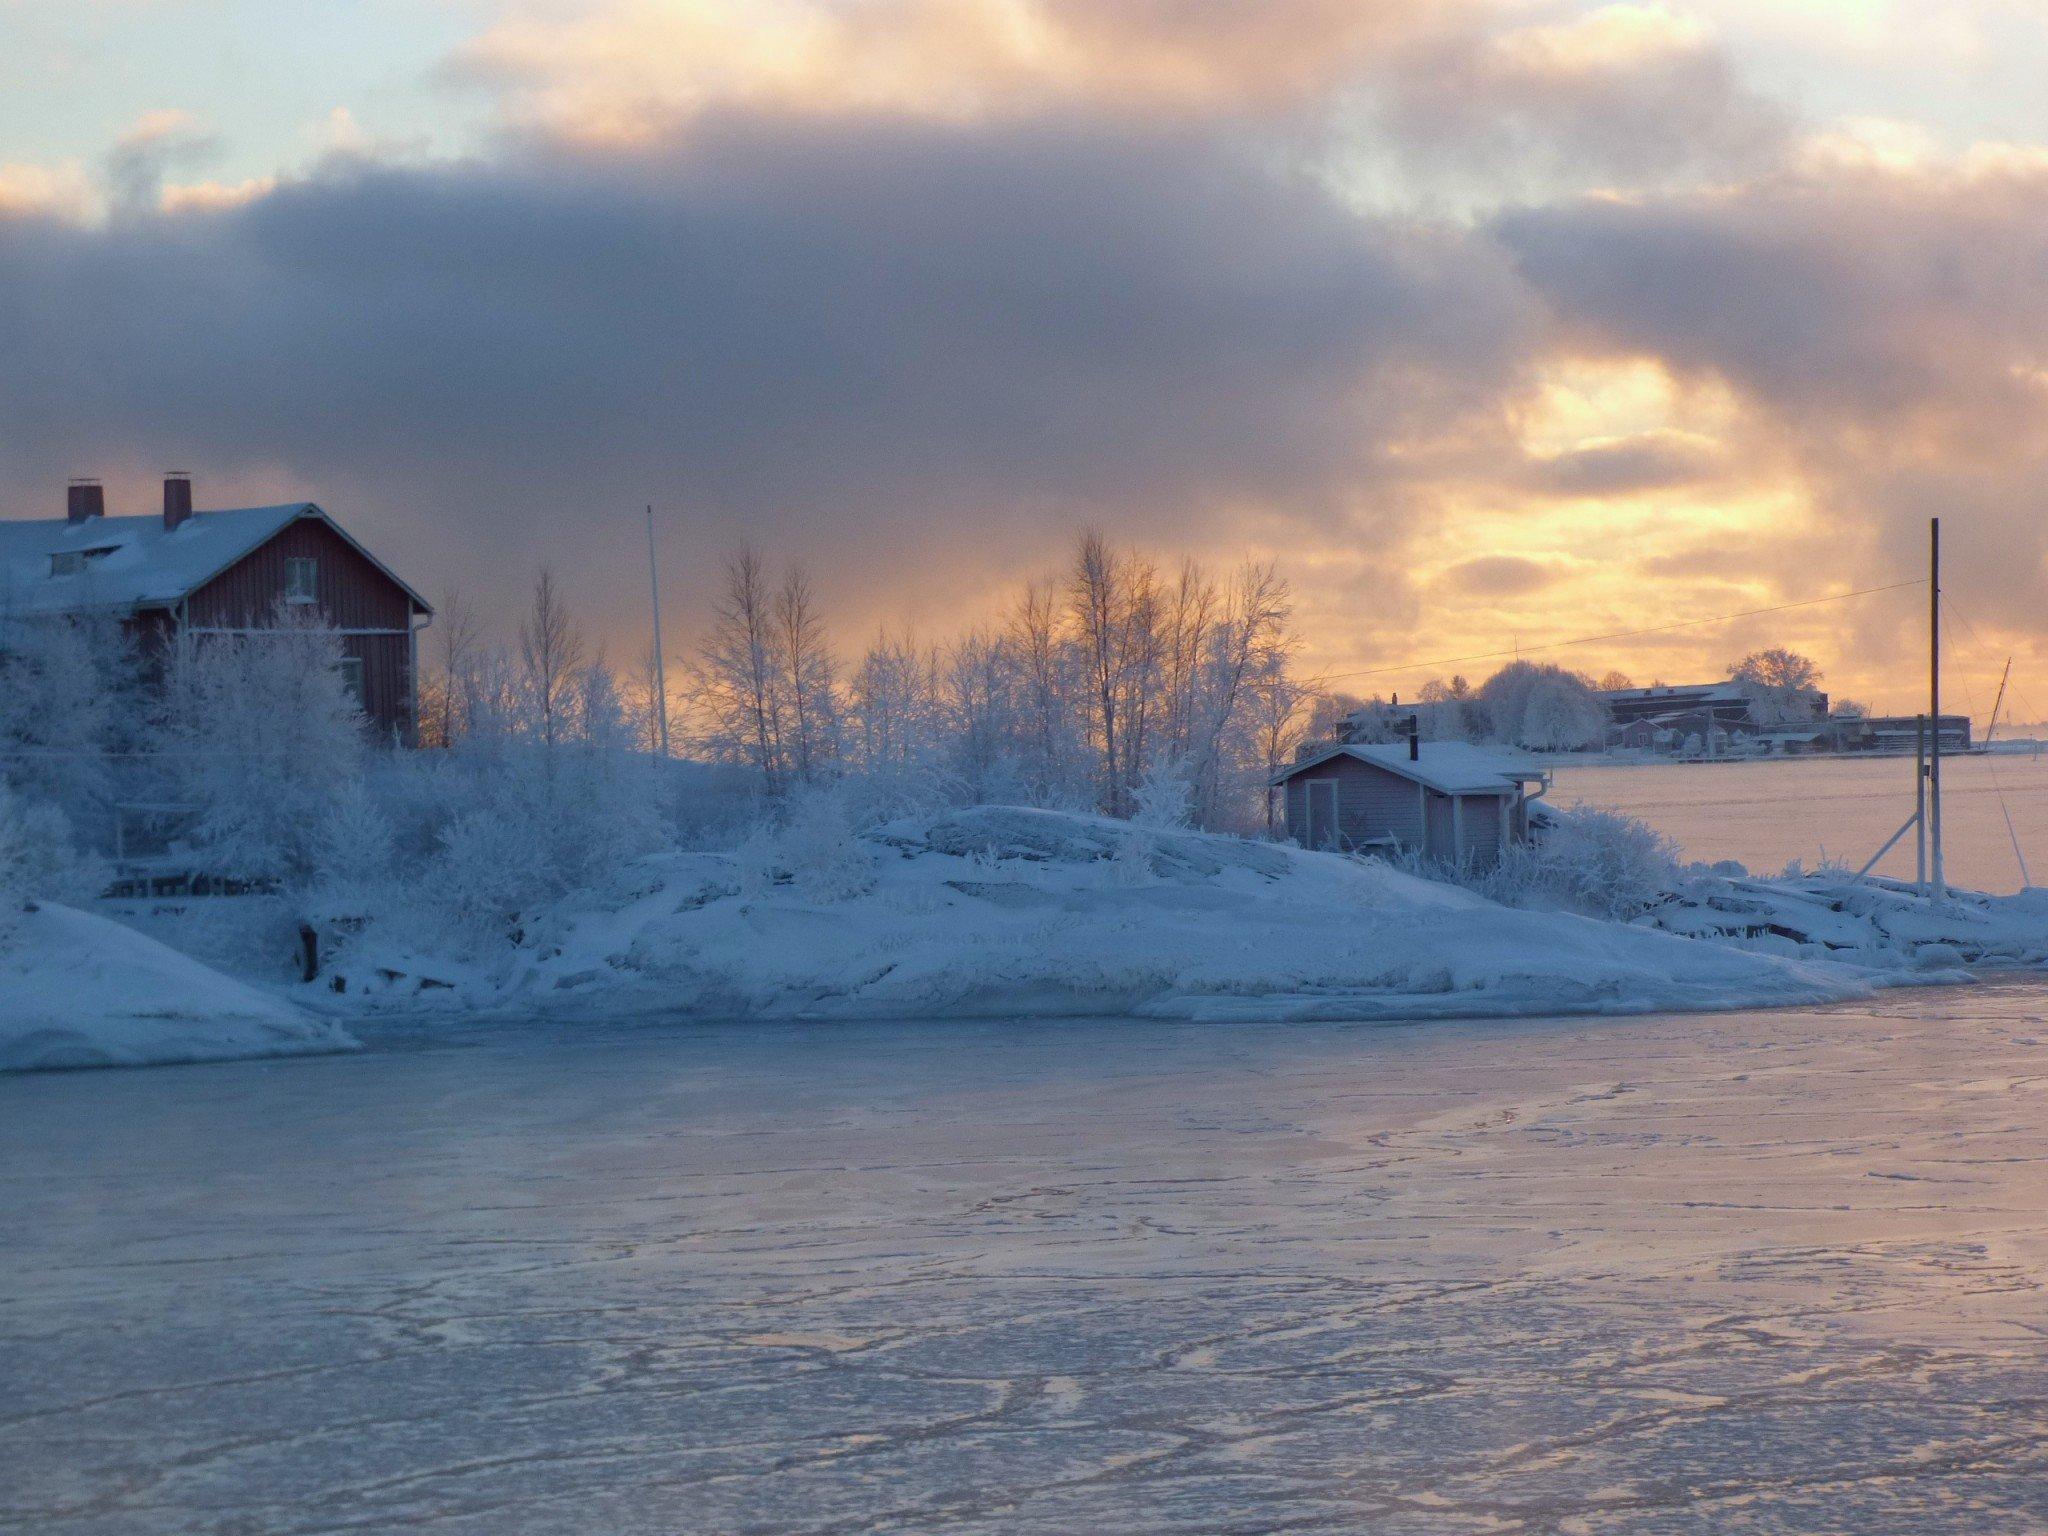 Suomenlinnan auringonlasku talvella